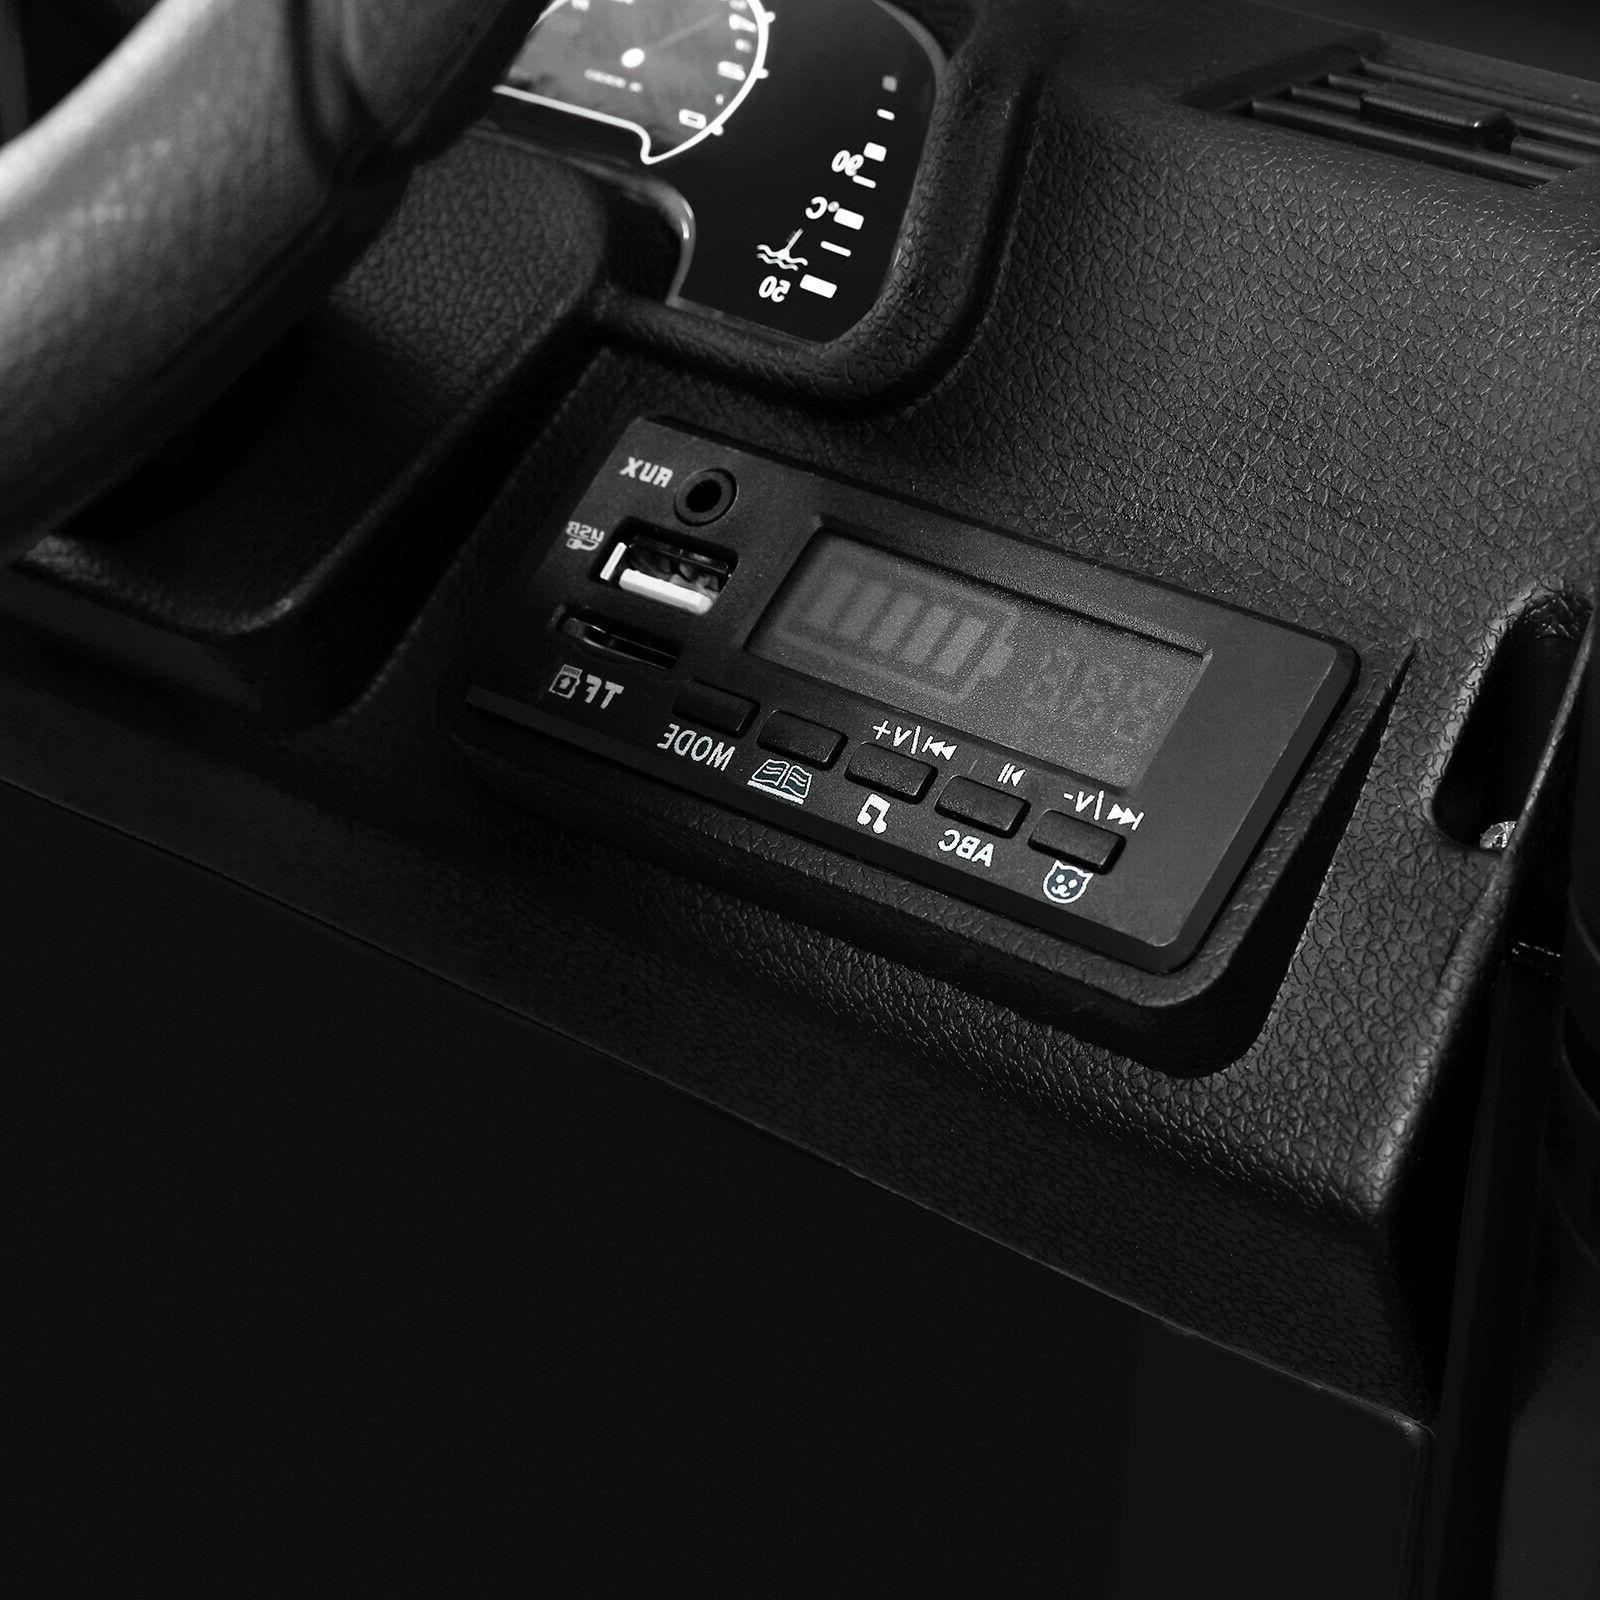 12V Ride on Car Toys MP3 LED Lights